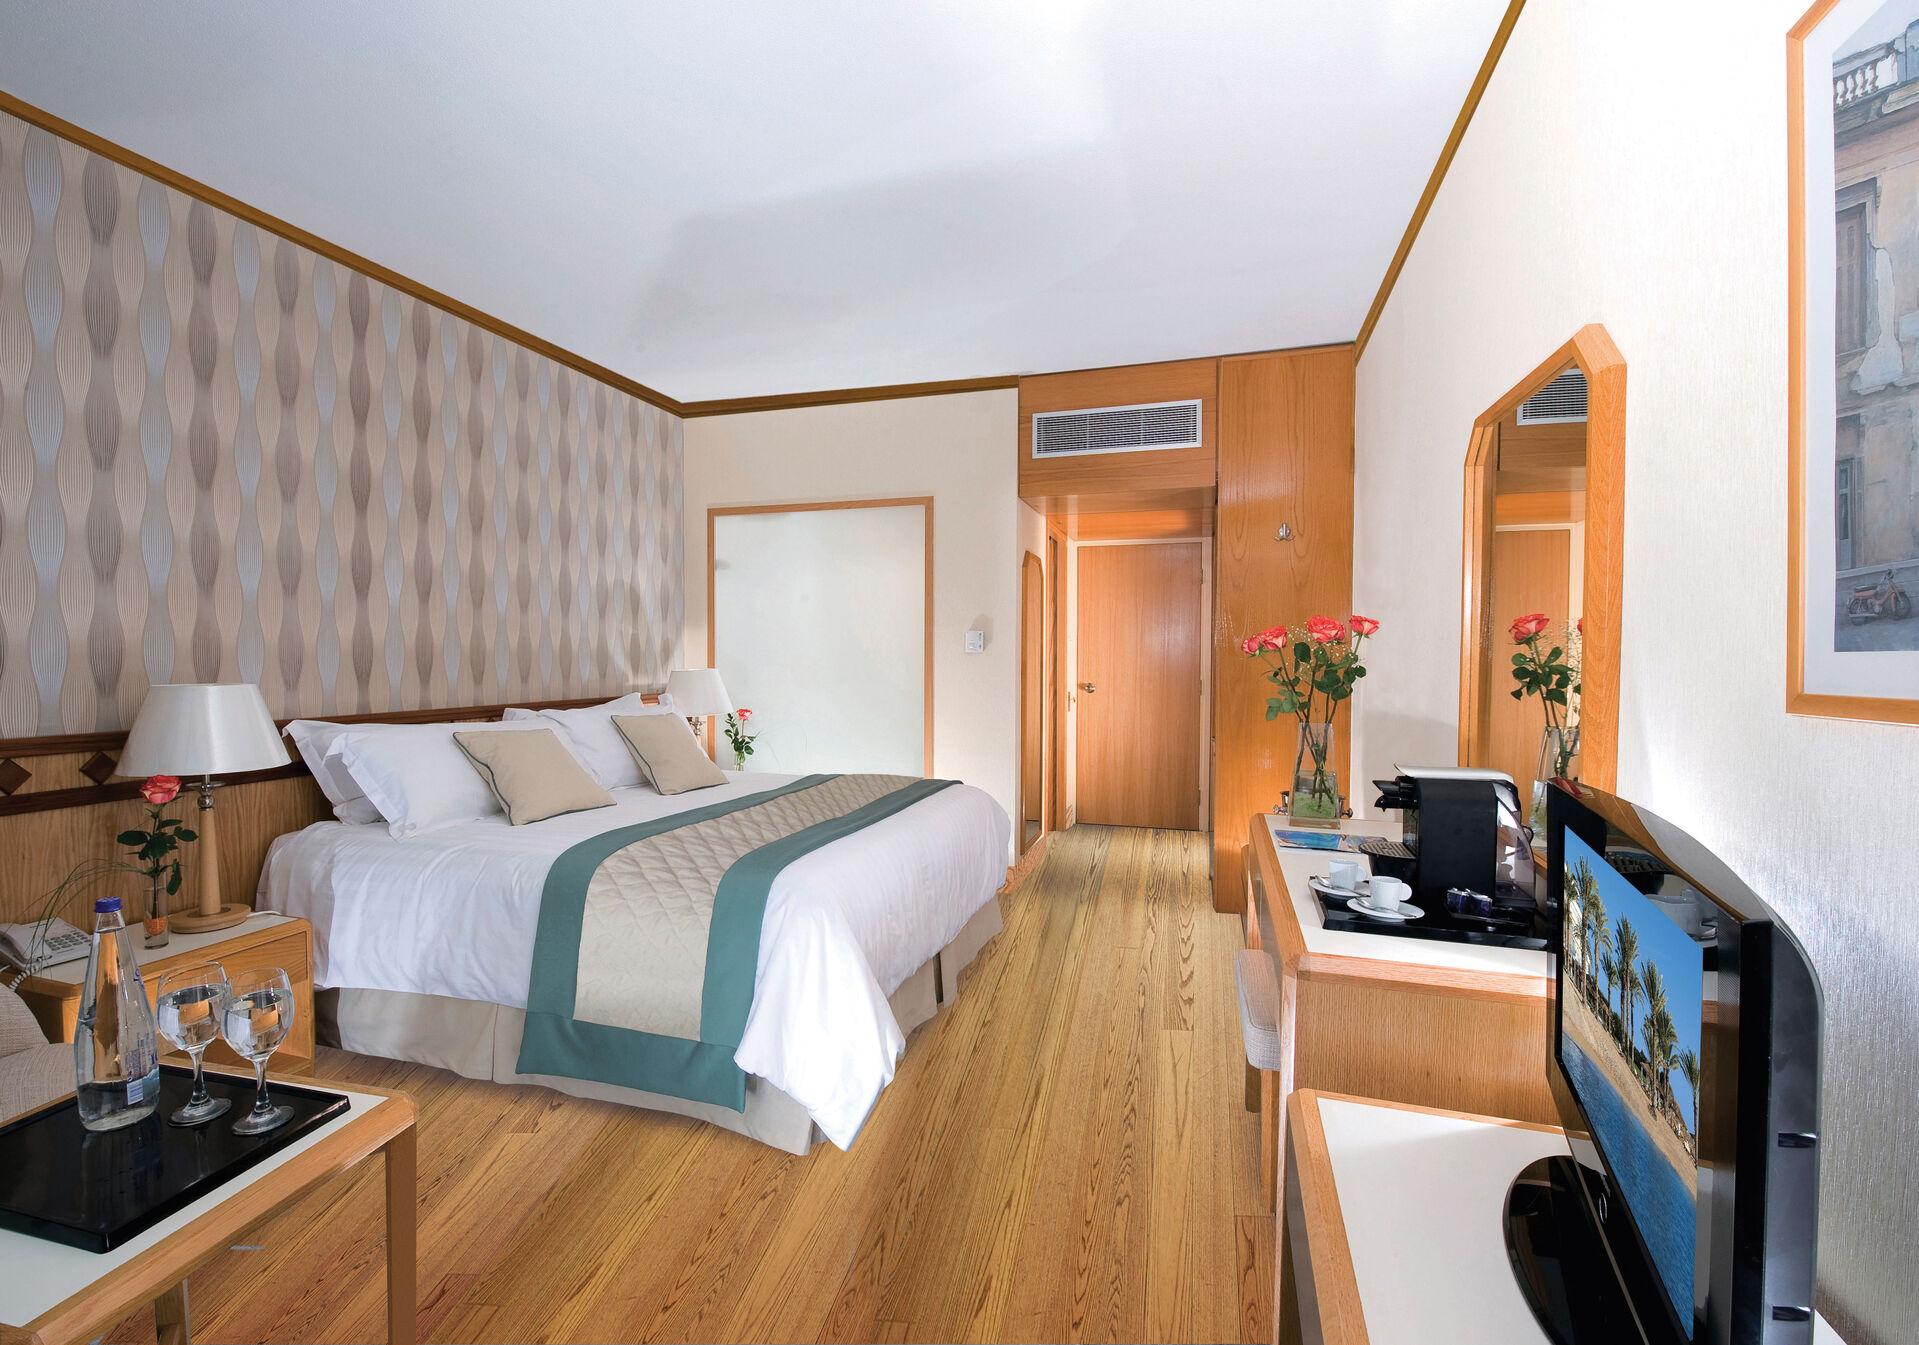 https://cms.satur.sk/data/imgs/tour_image/orig/17-pioneer-beach-hotel-standard-room-lv-1972639.jpg